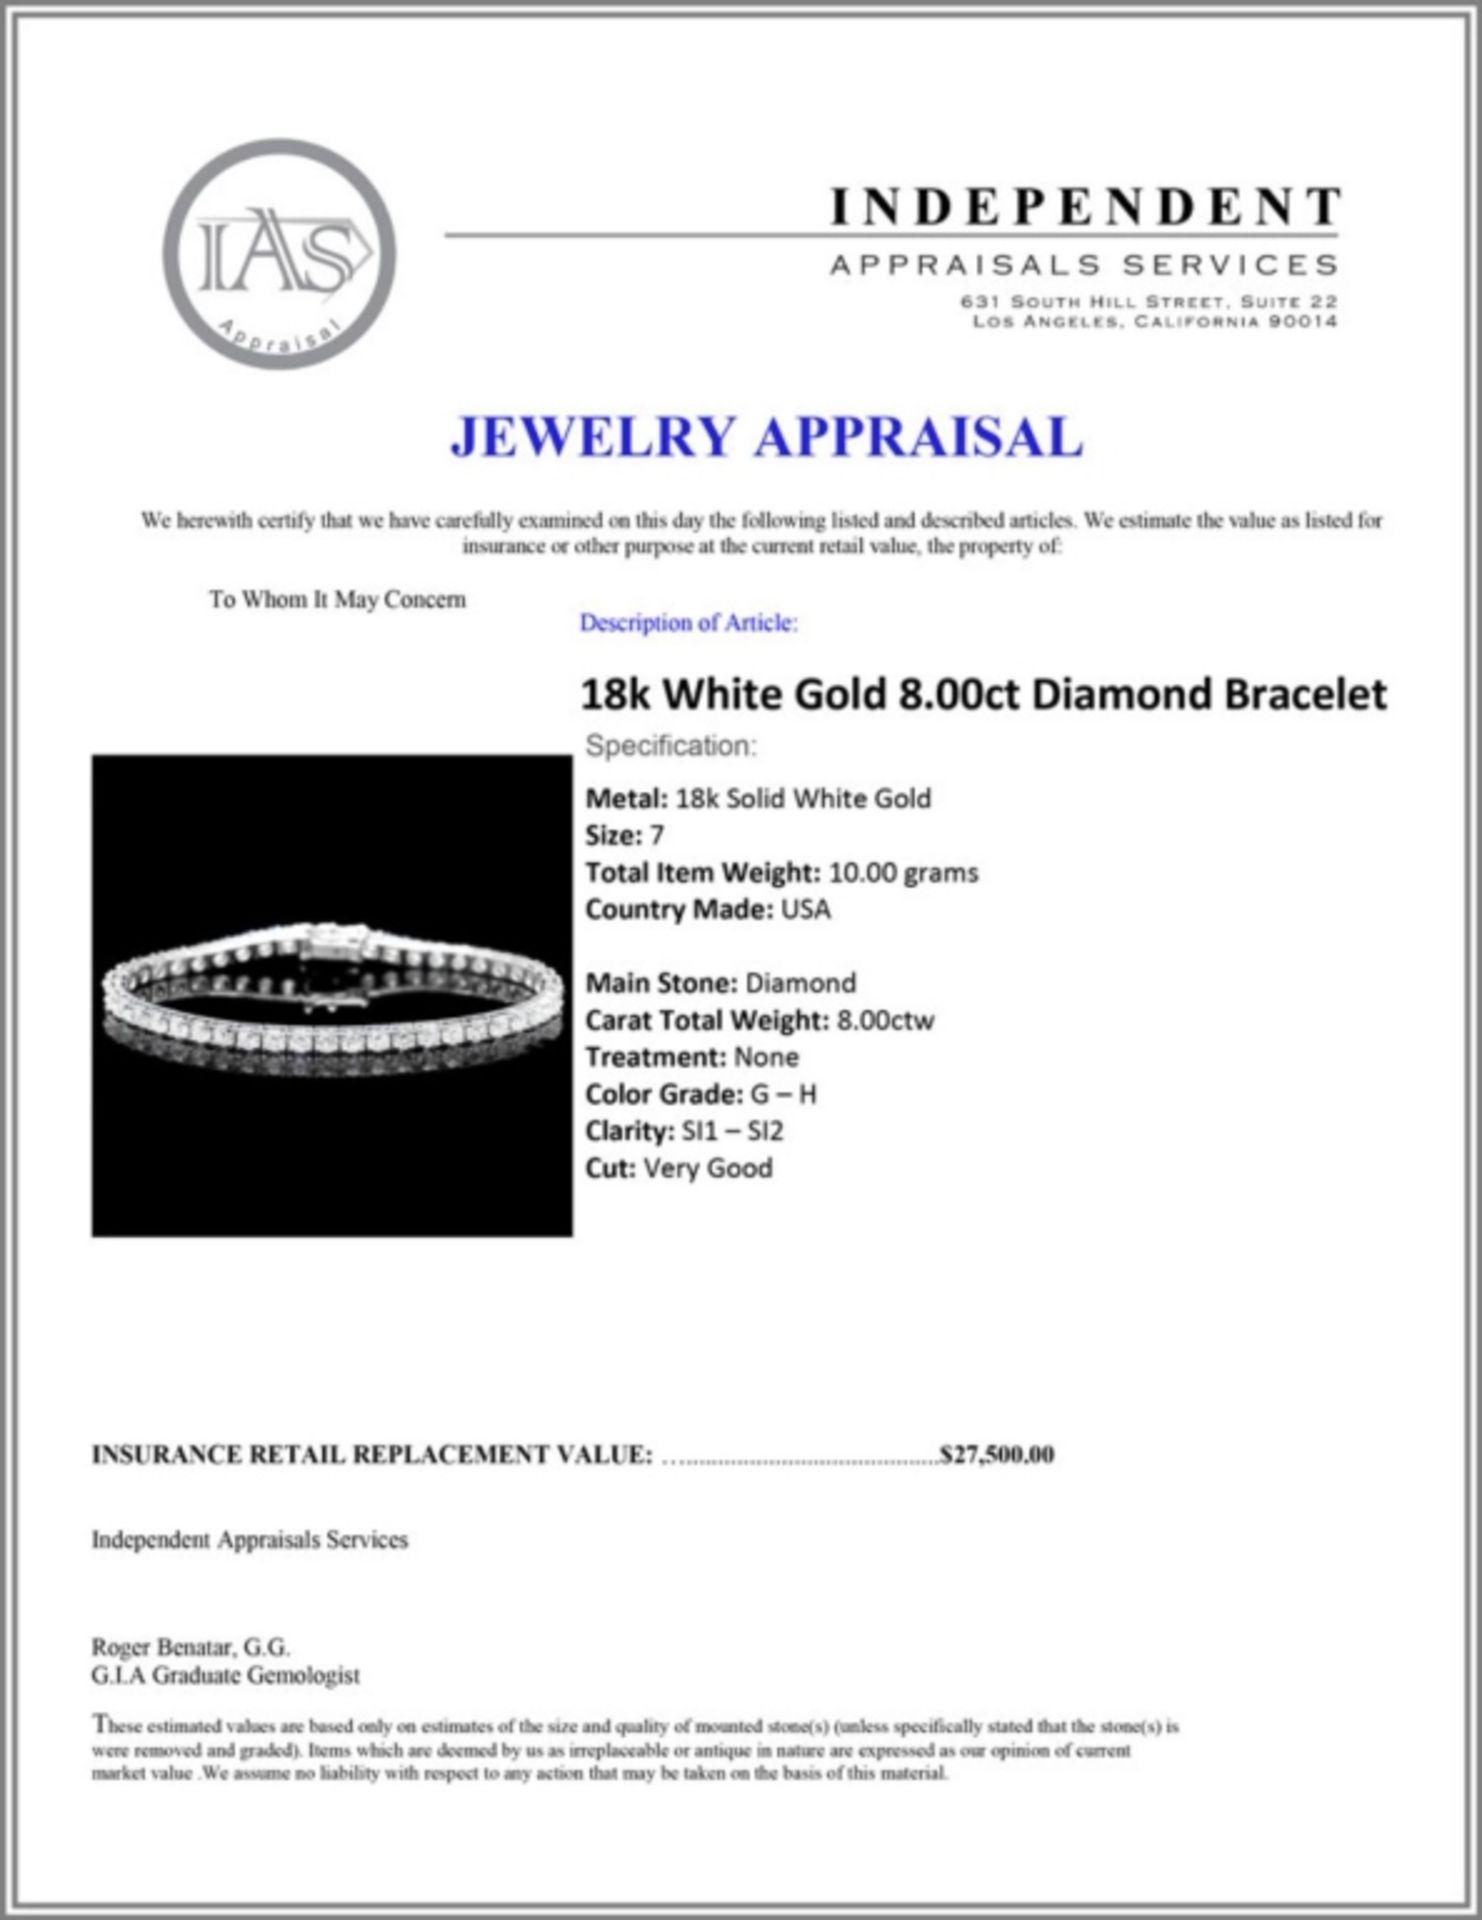 ^18k White Gold 8.00ct Diamond Bracelet - Image 4 of 4